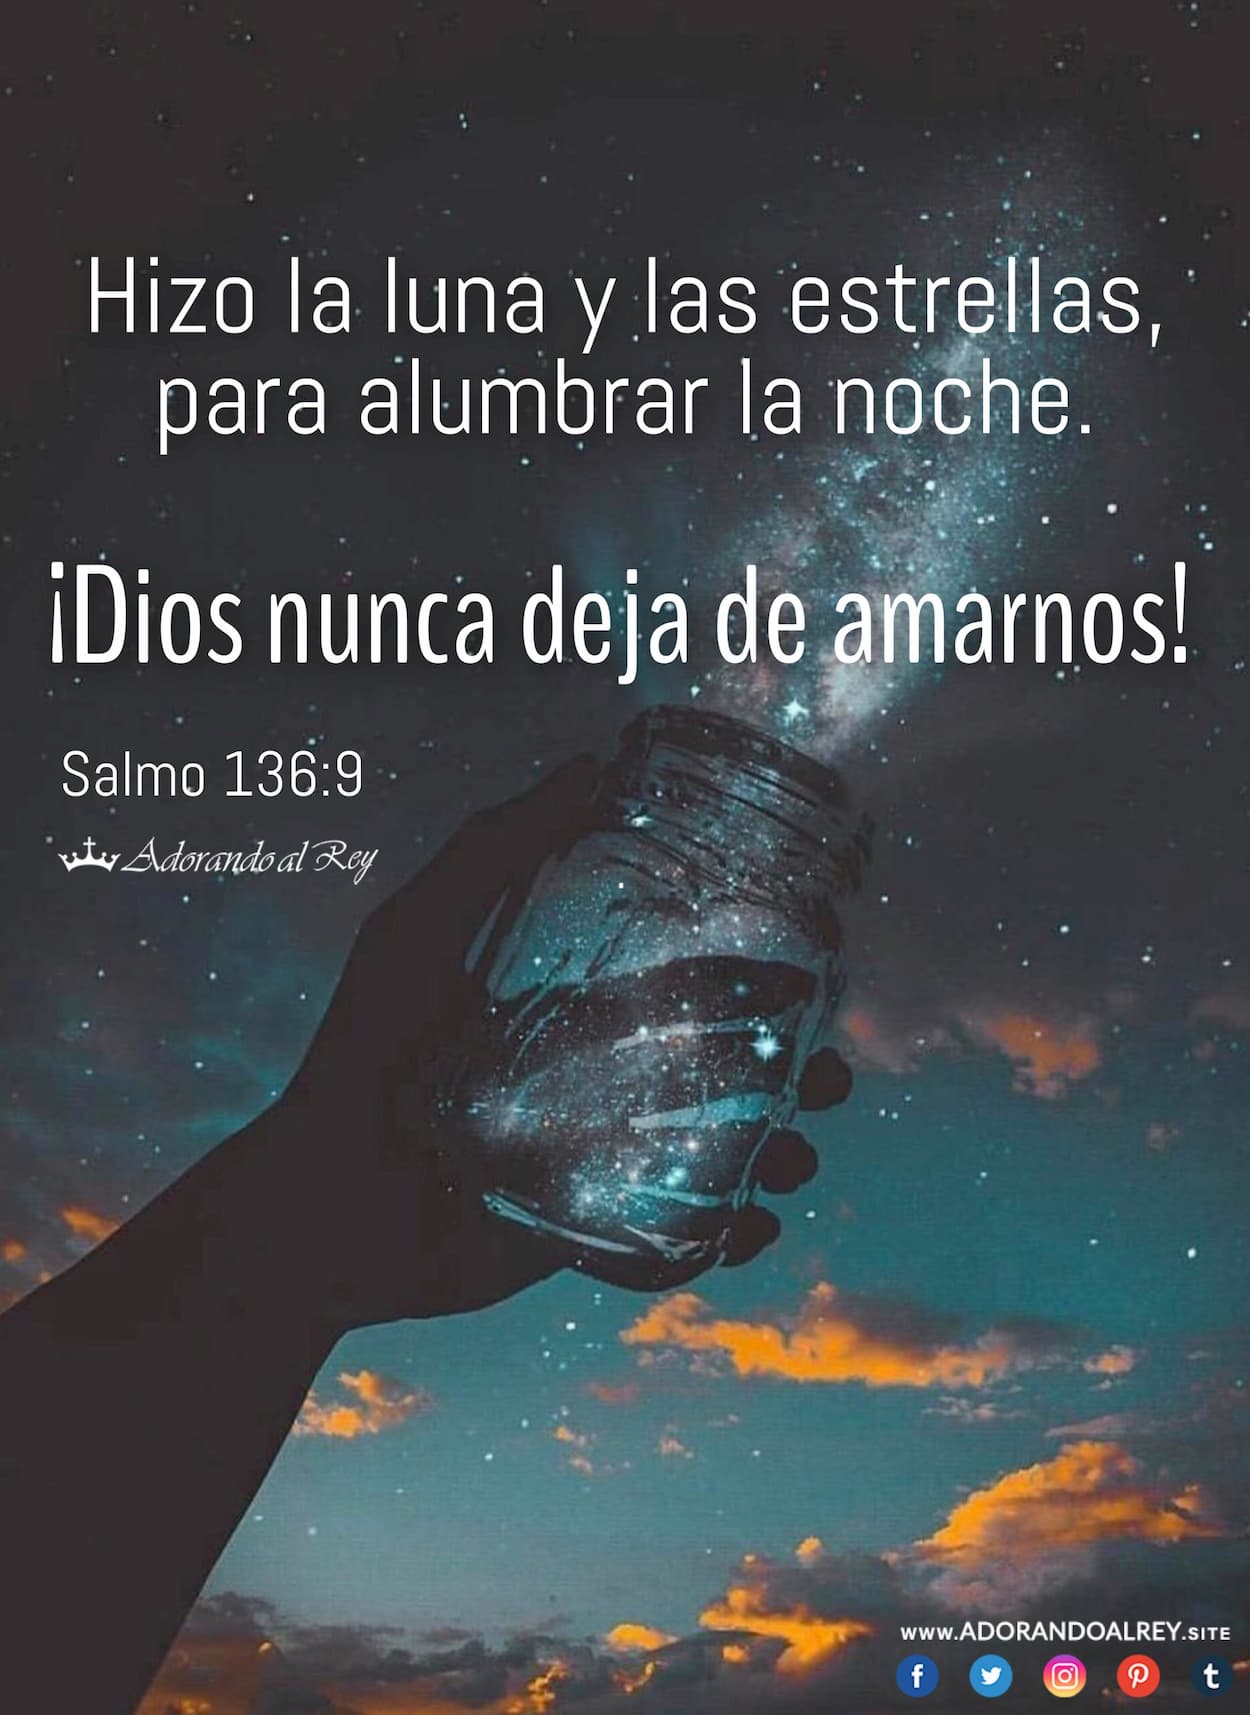 Salmo 136:9